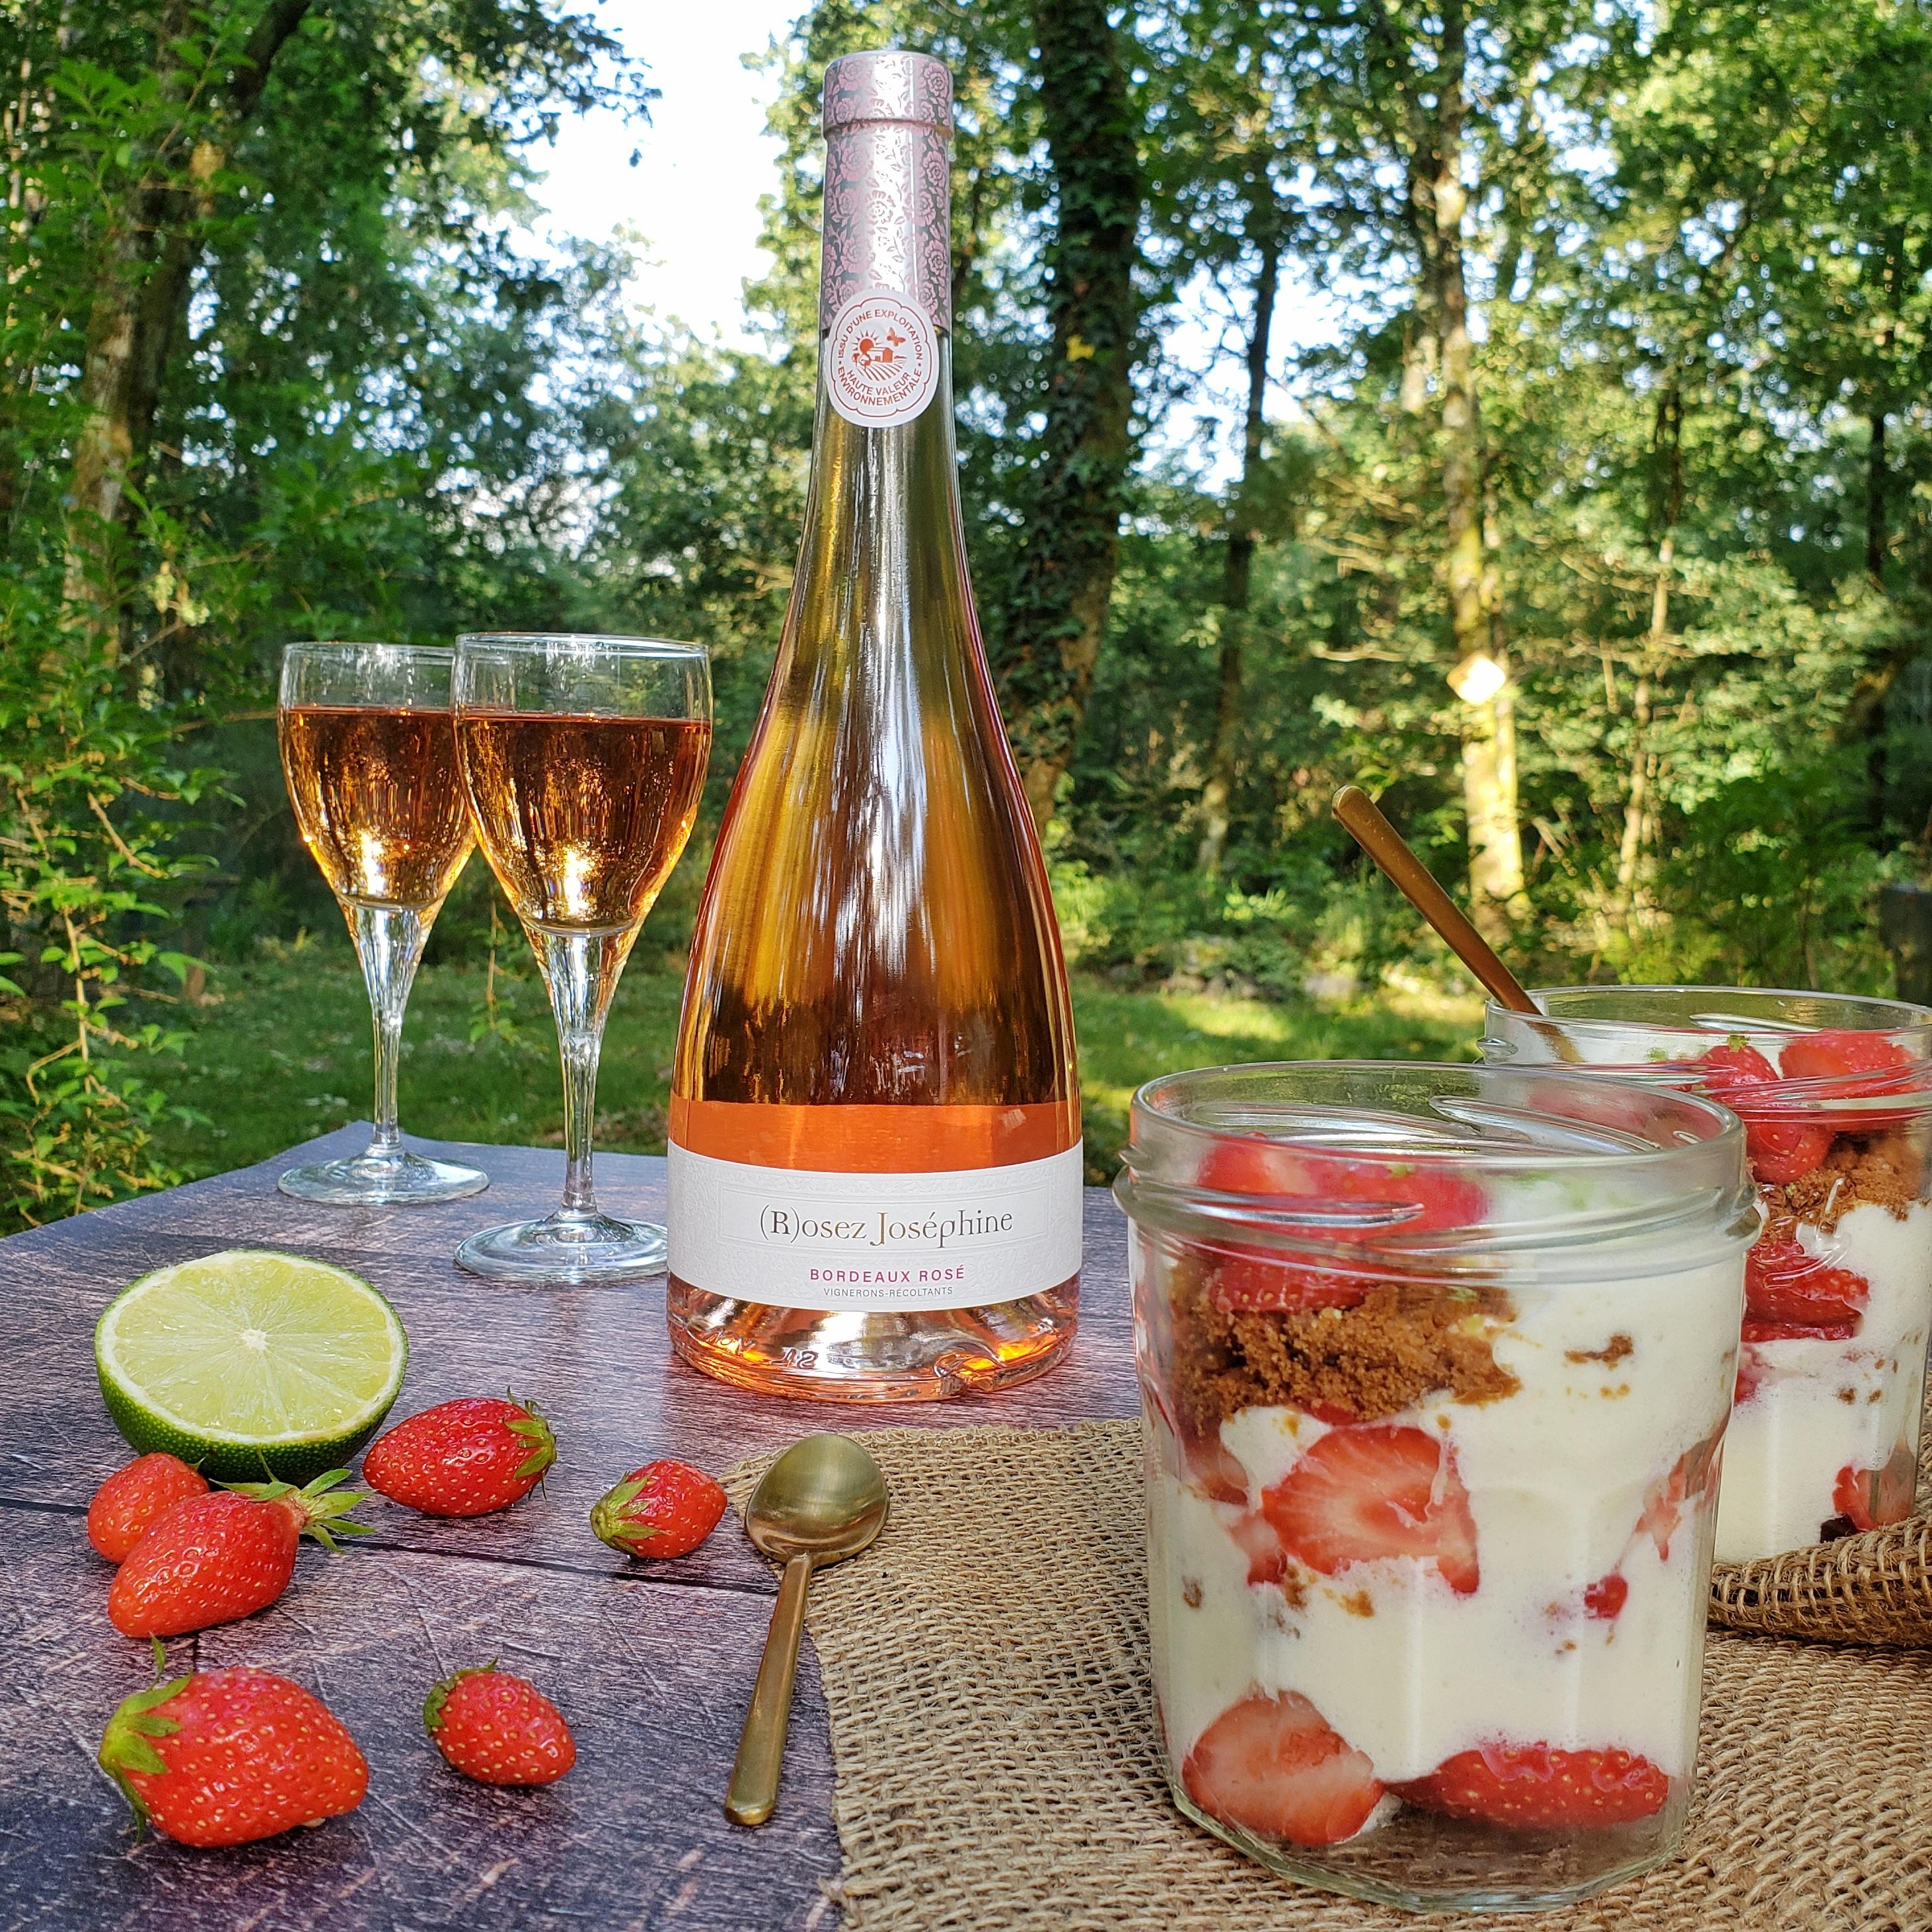 recette verrine fraise mascarpone rosé